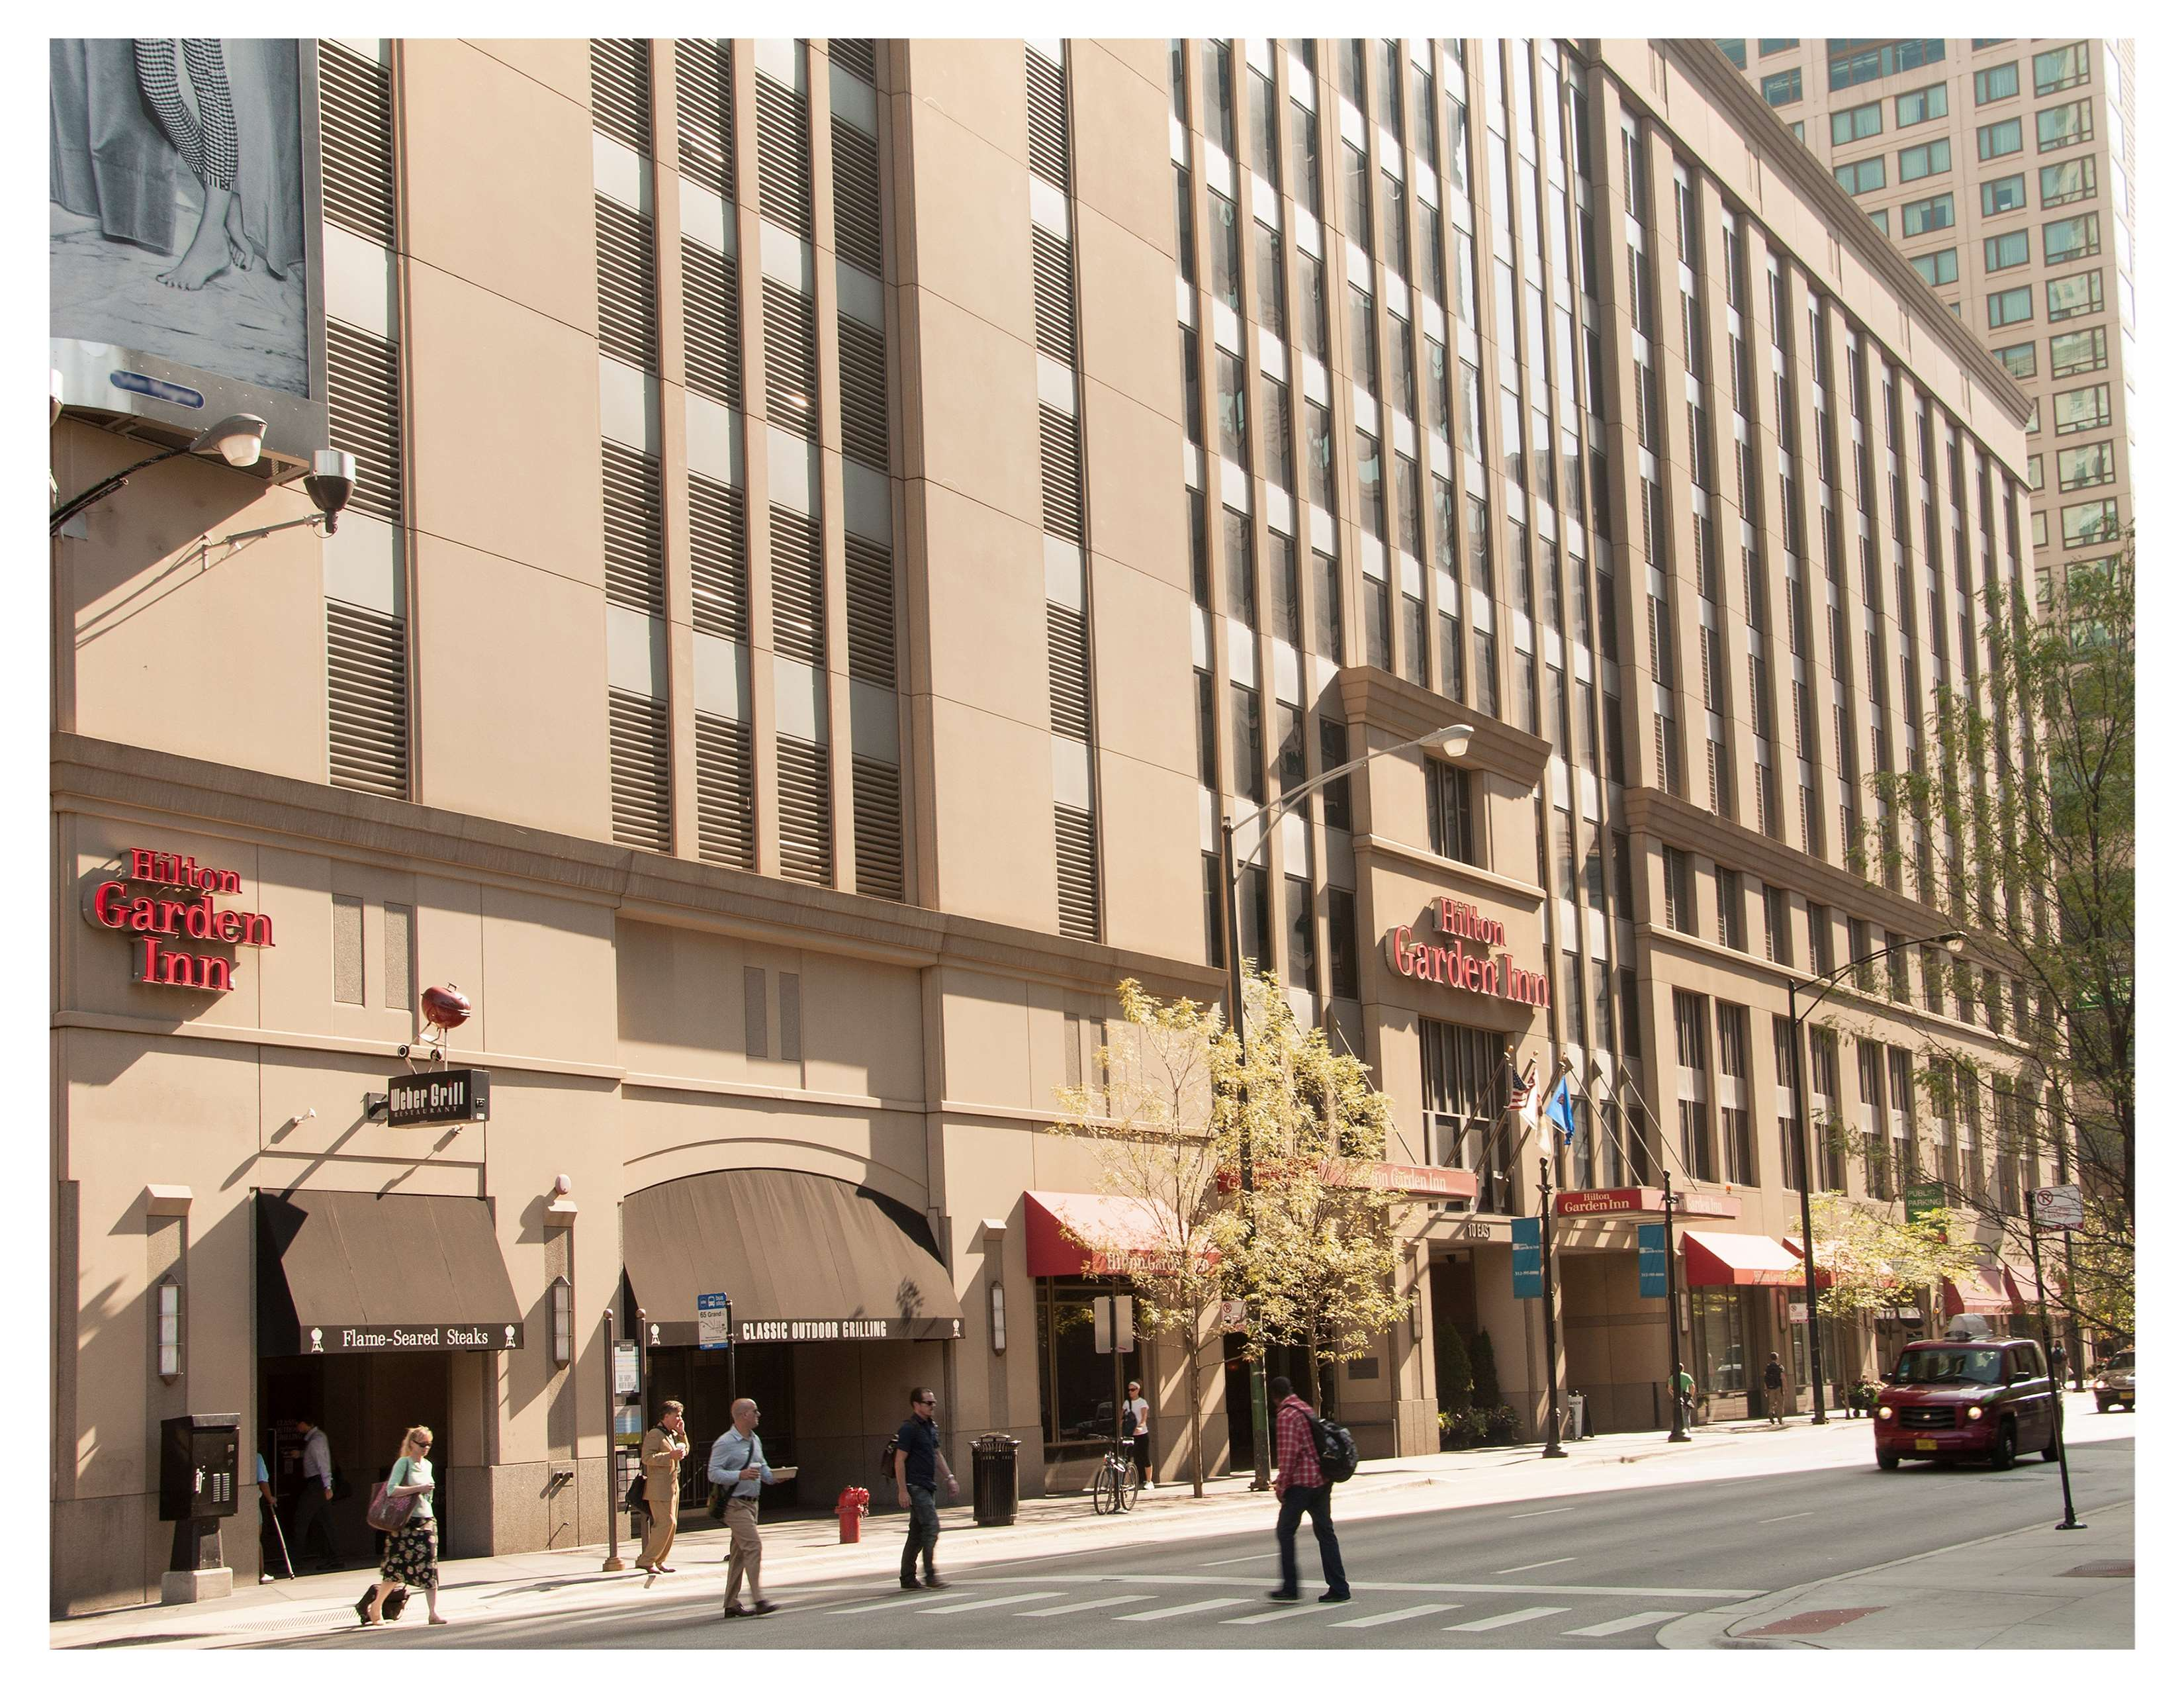 Hilton Garden Inn Chicago Downtown/Magnificent Mile image 1